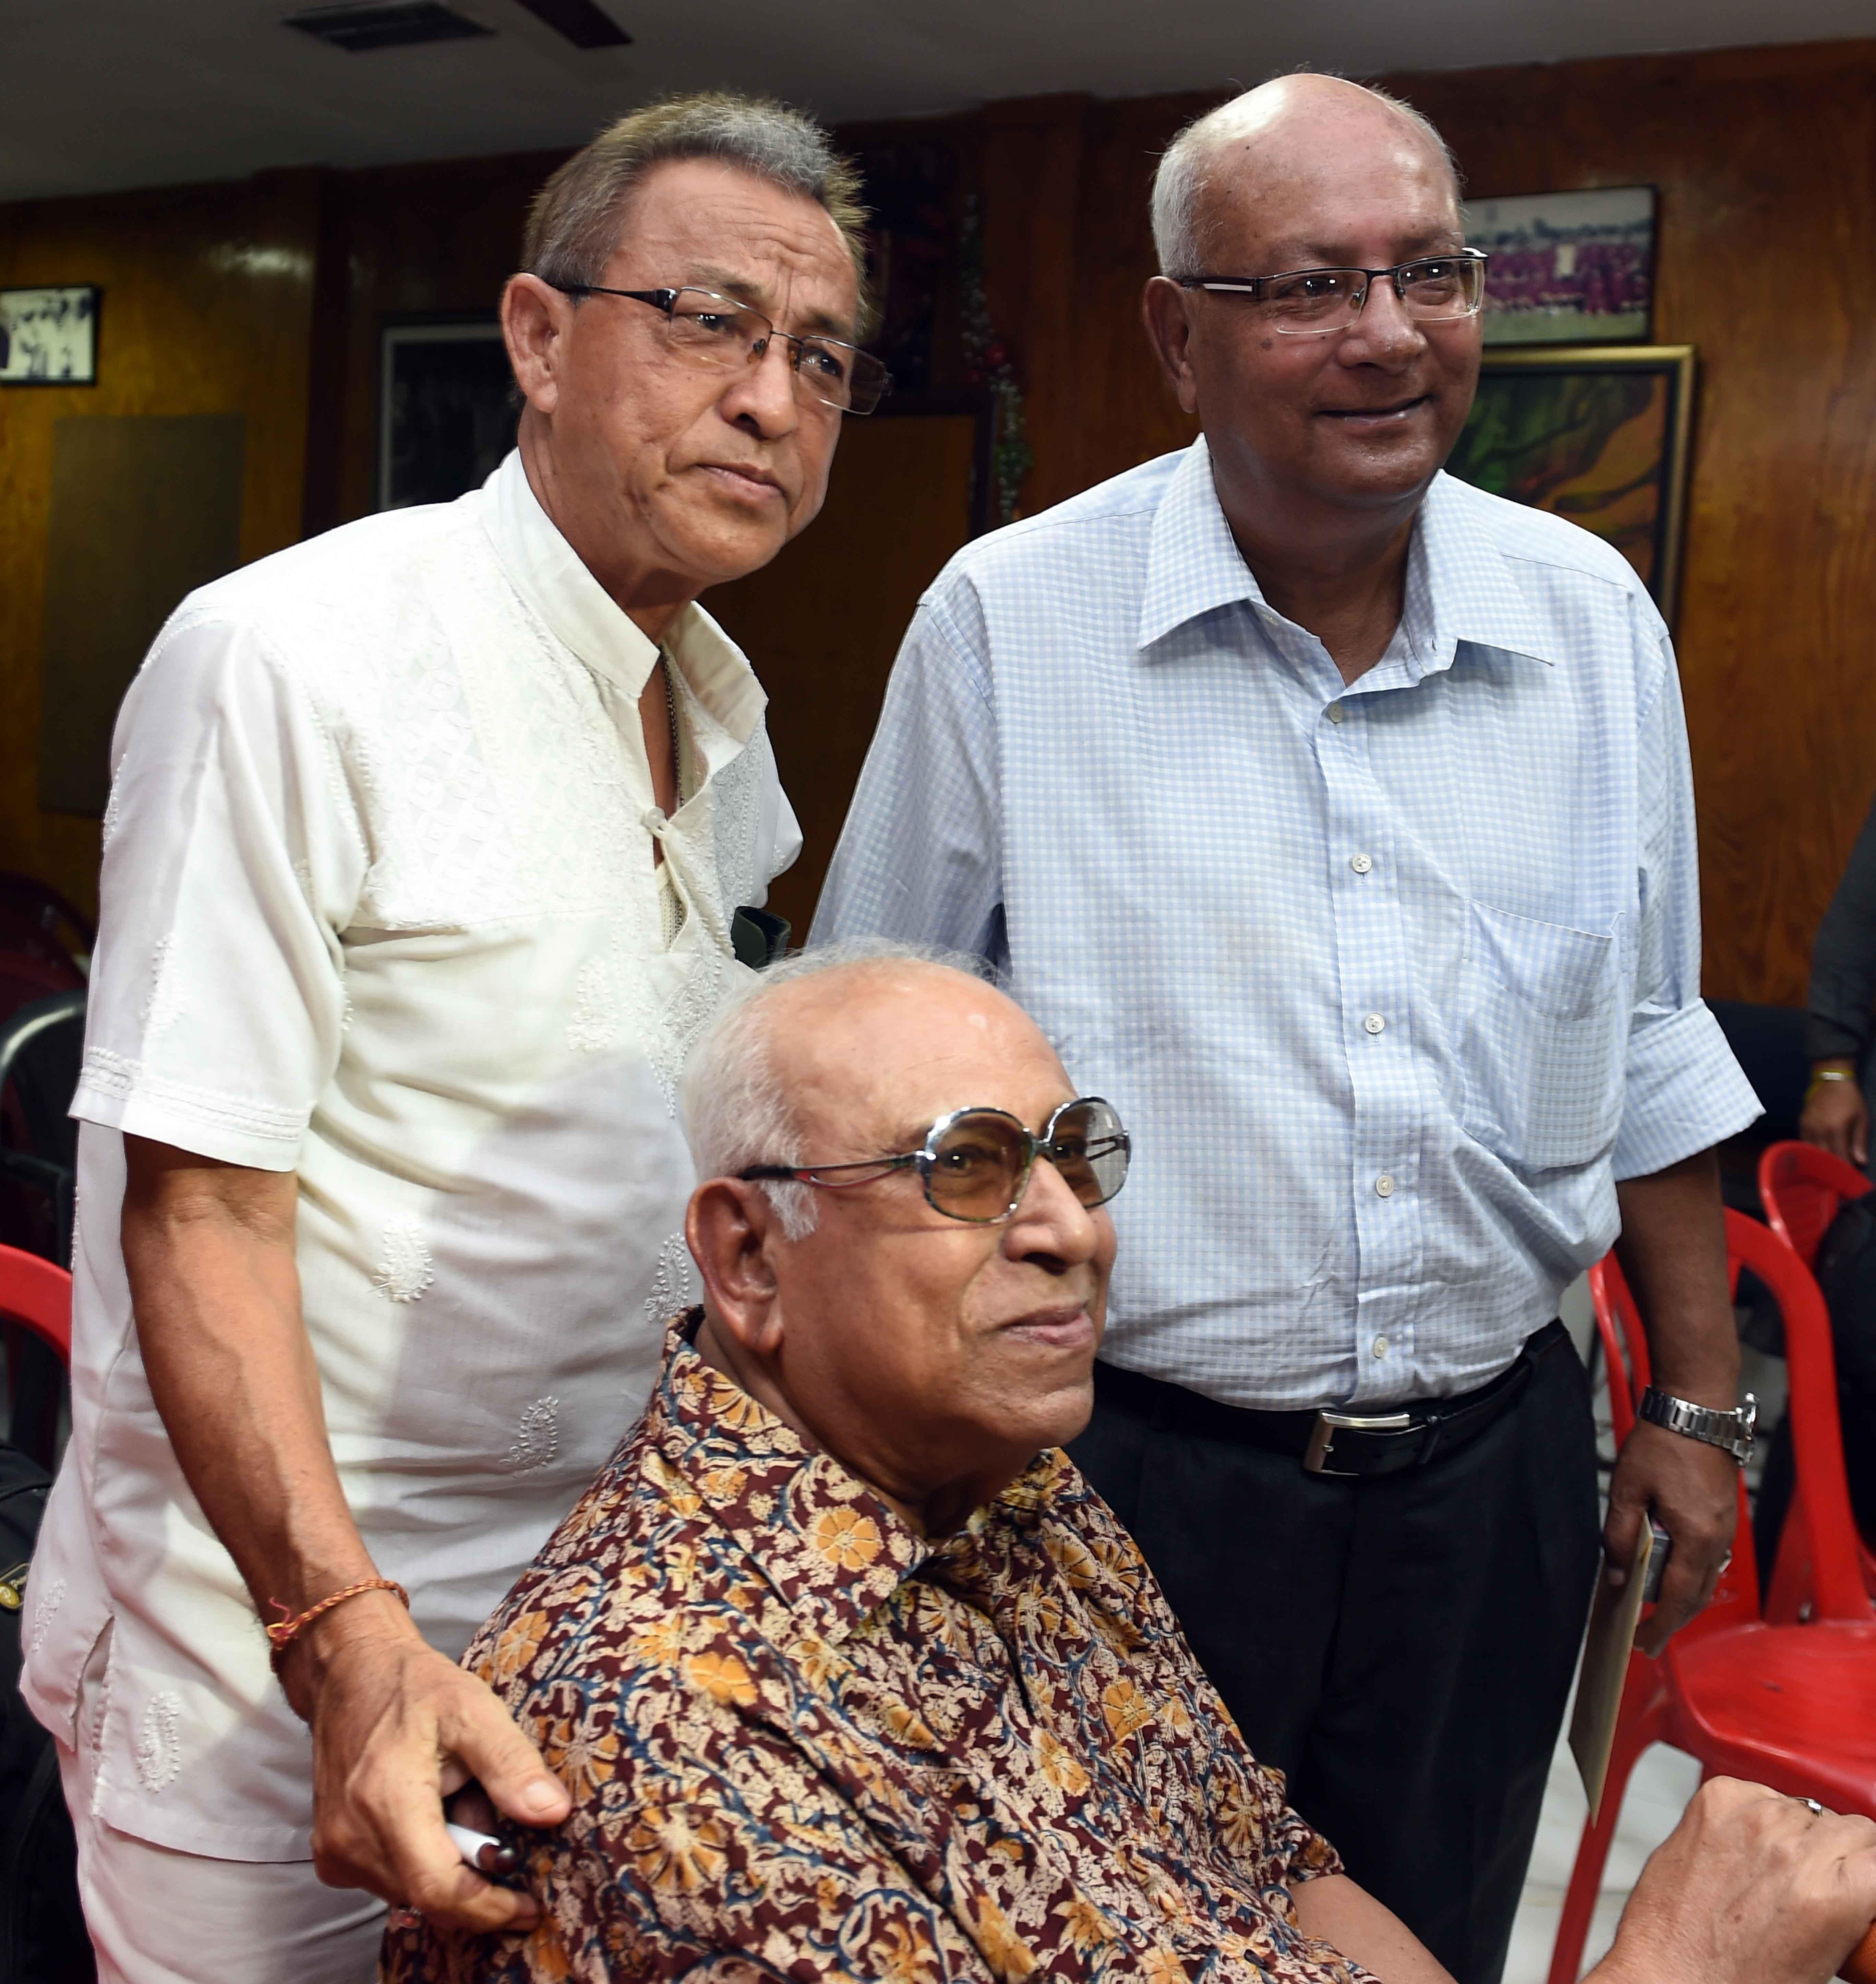 P.K. Banerjee with Shyam Thapa and Subhas Bhowmik.